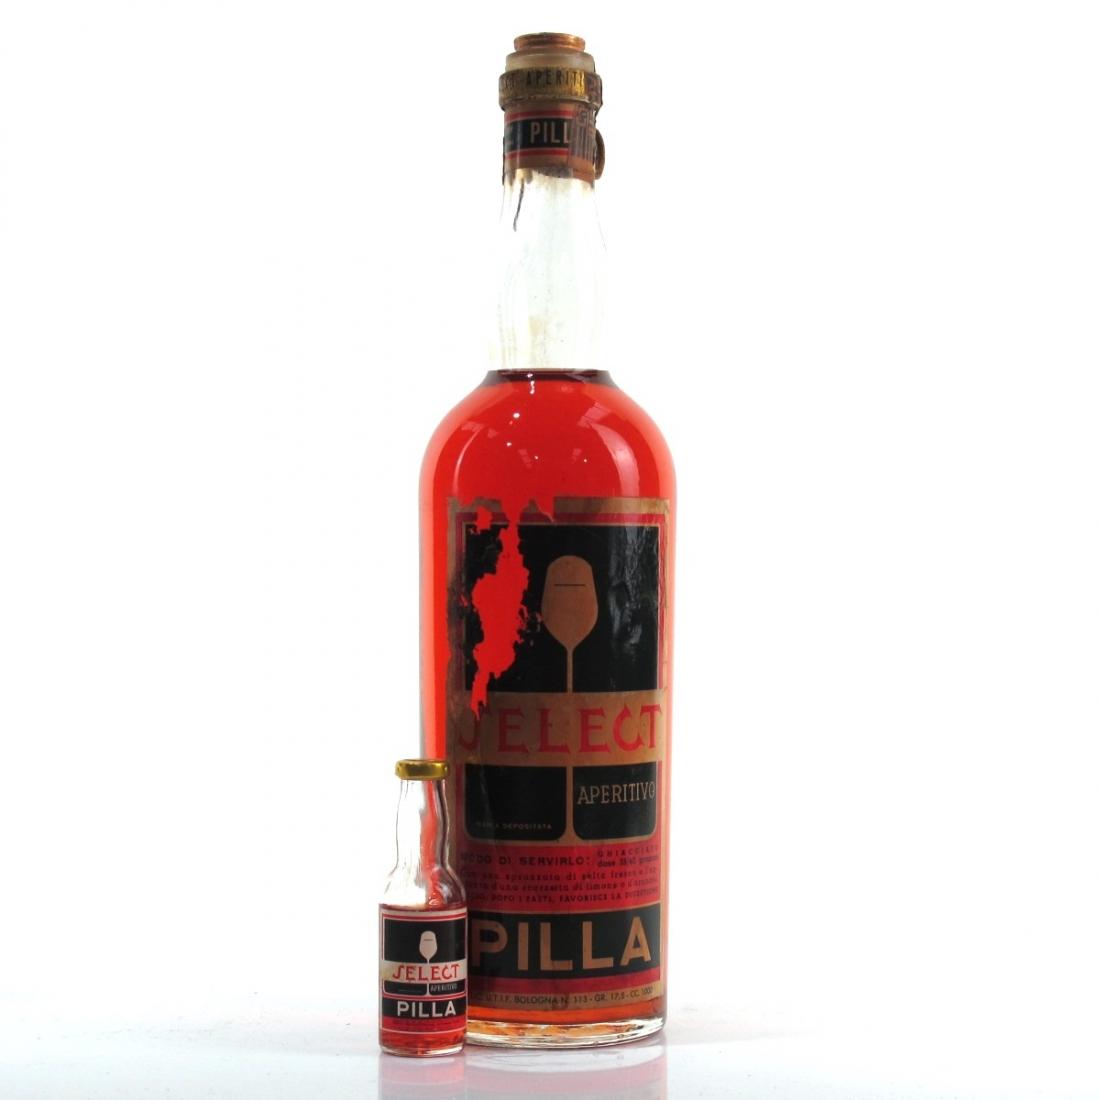 Pilla Select Aperitivo 1 Litre 1950s / Includes Minaiture